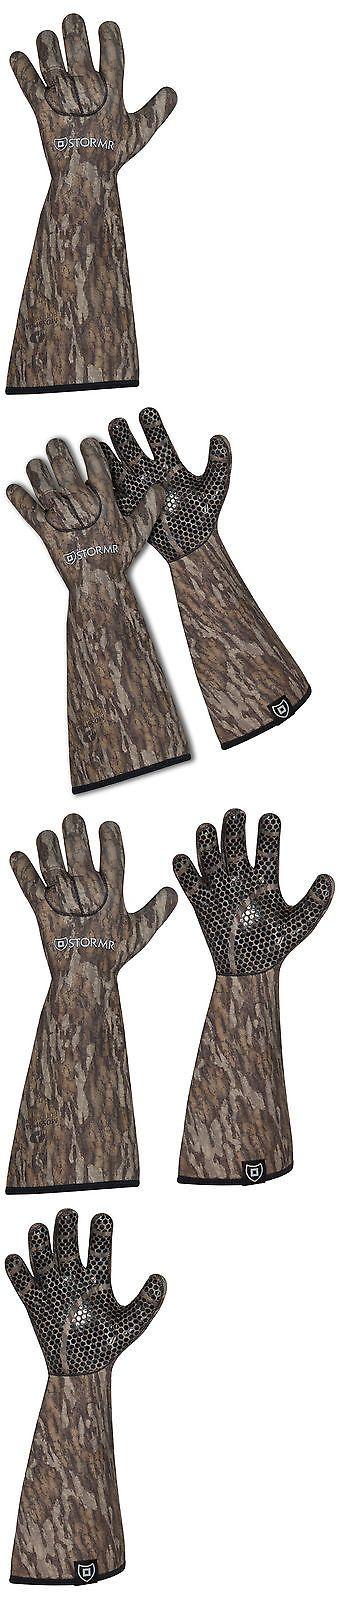 Gloves 65974: Stormr Stealth Gauntlet Glove Mossy Oak Bottomland Neoprene Fleece -> BUY IT NOW ONLY: $53.99 on eBay!